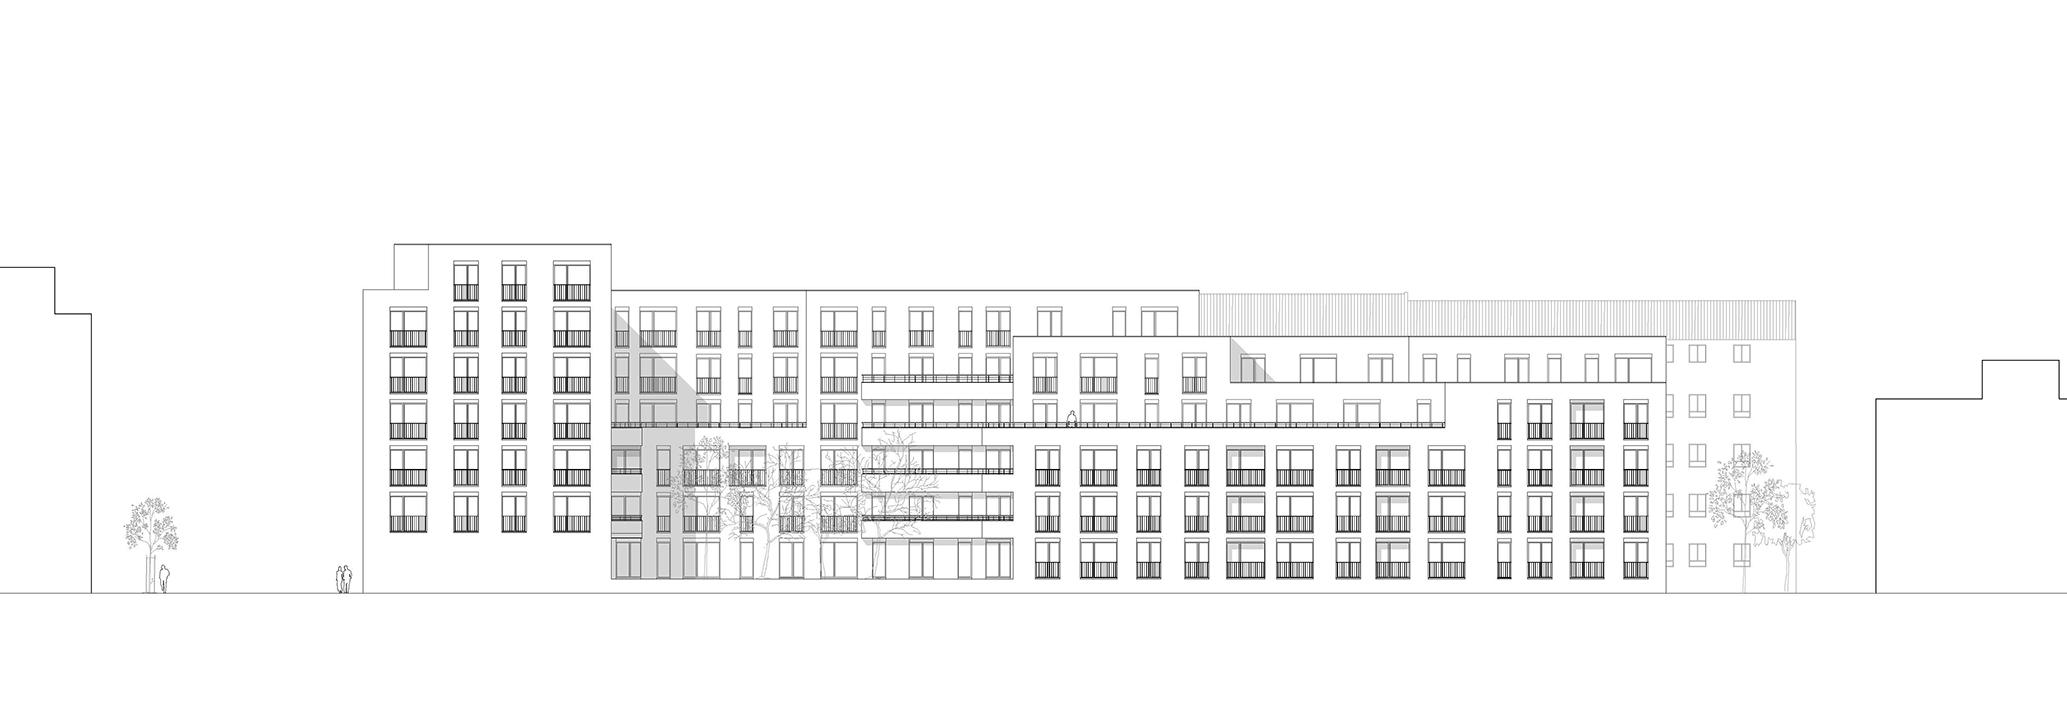 Krifteler Straße Frankfurt Wohnungsbau dreisterneplus Meili Peter